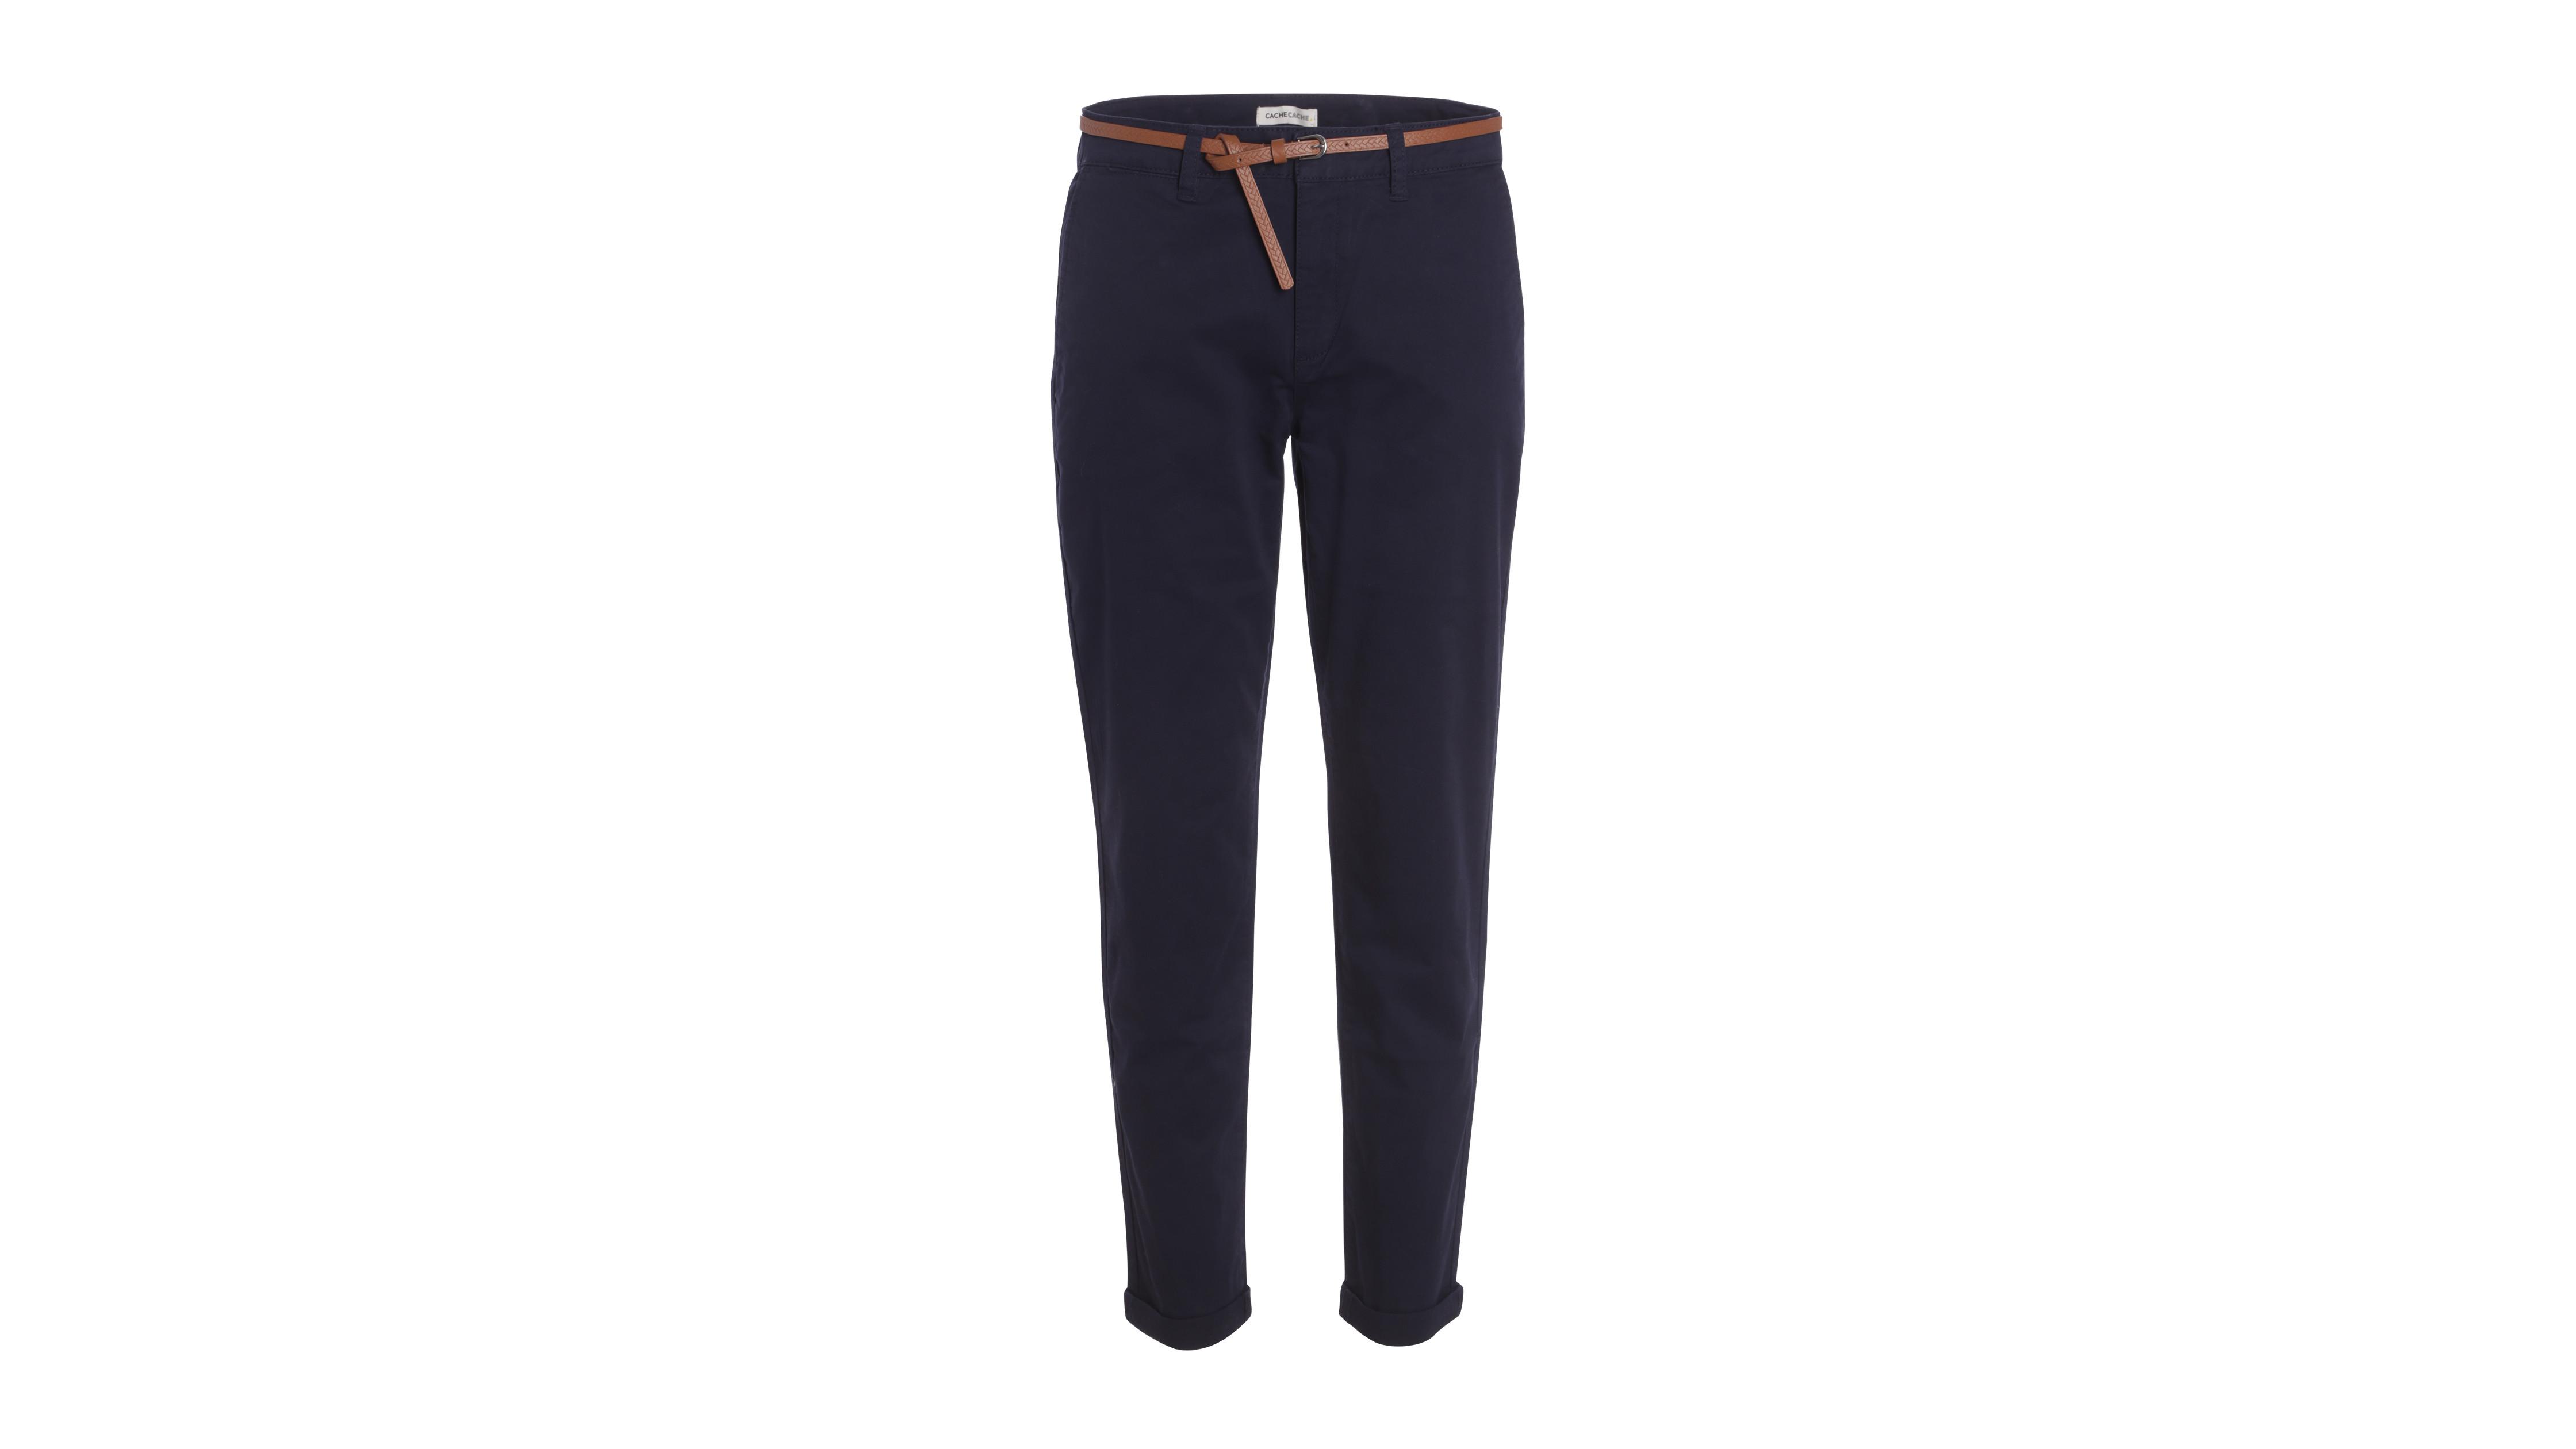 7be6eee5b Pantalon chino avec ceinture bleu marine femme